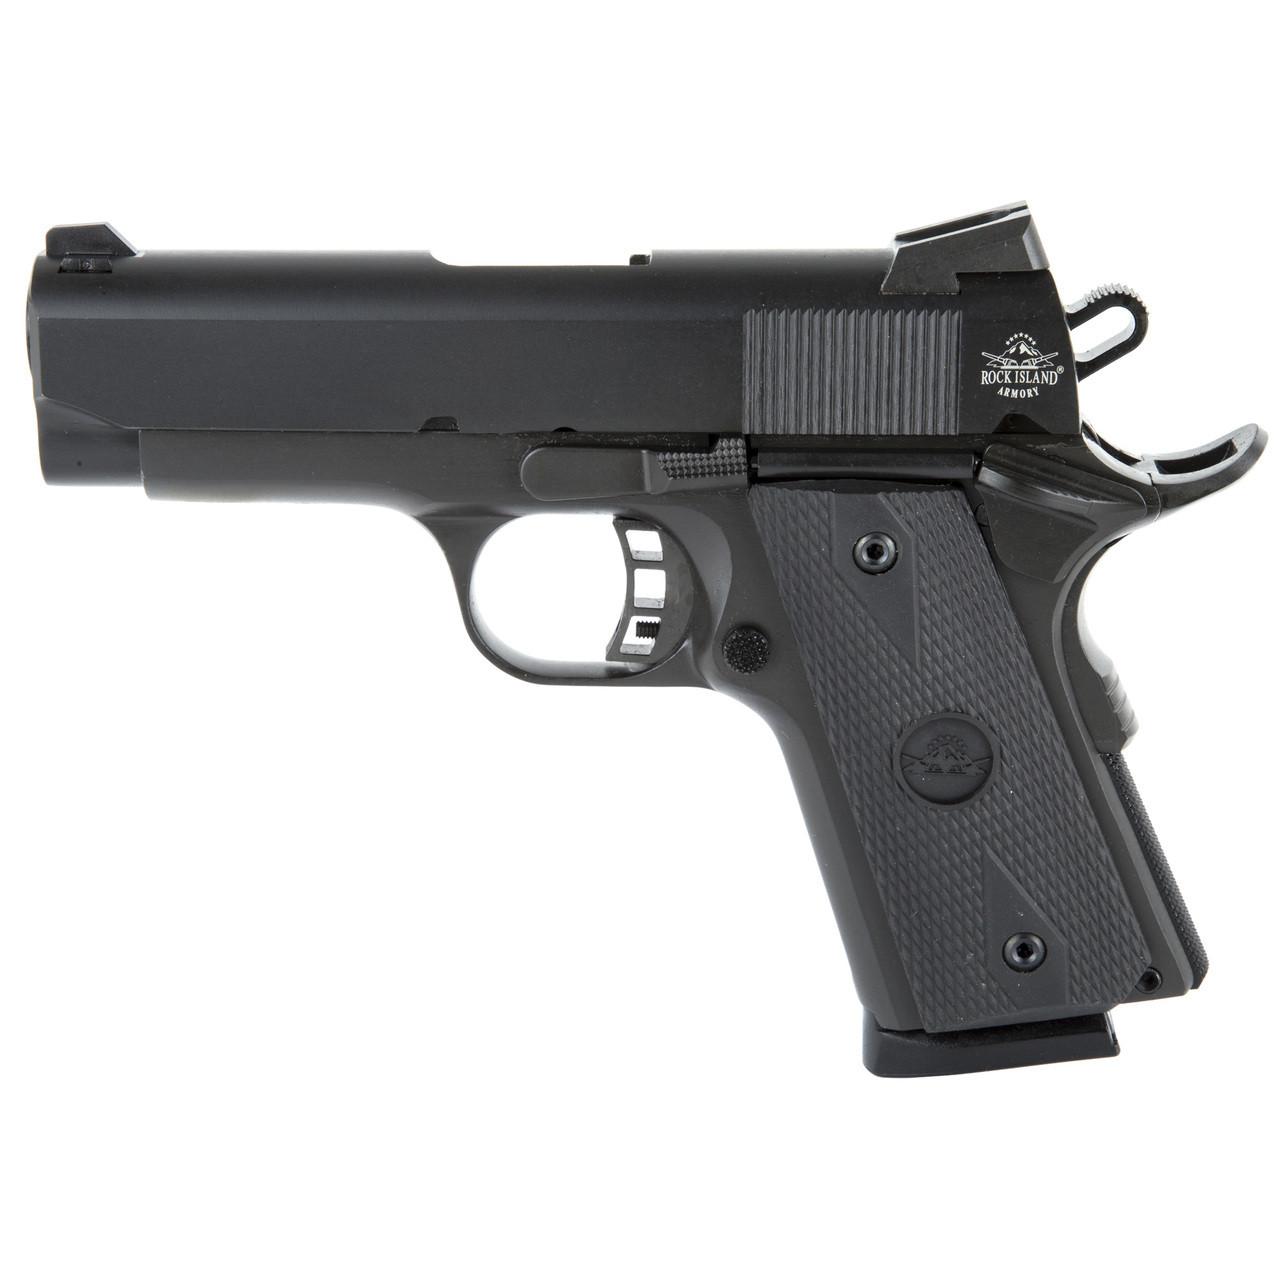 Armscor/Rock Island Standard CALIFORNIA LEGAL - .45ACP